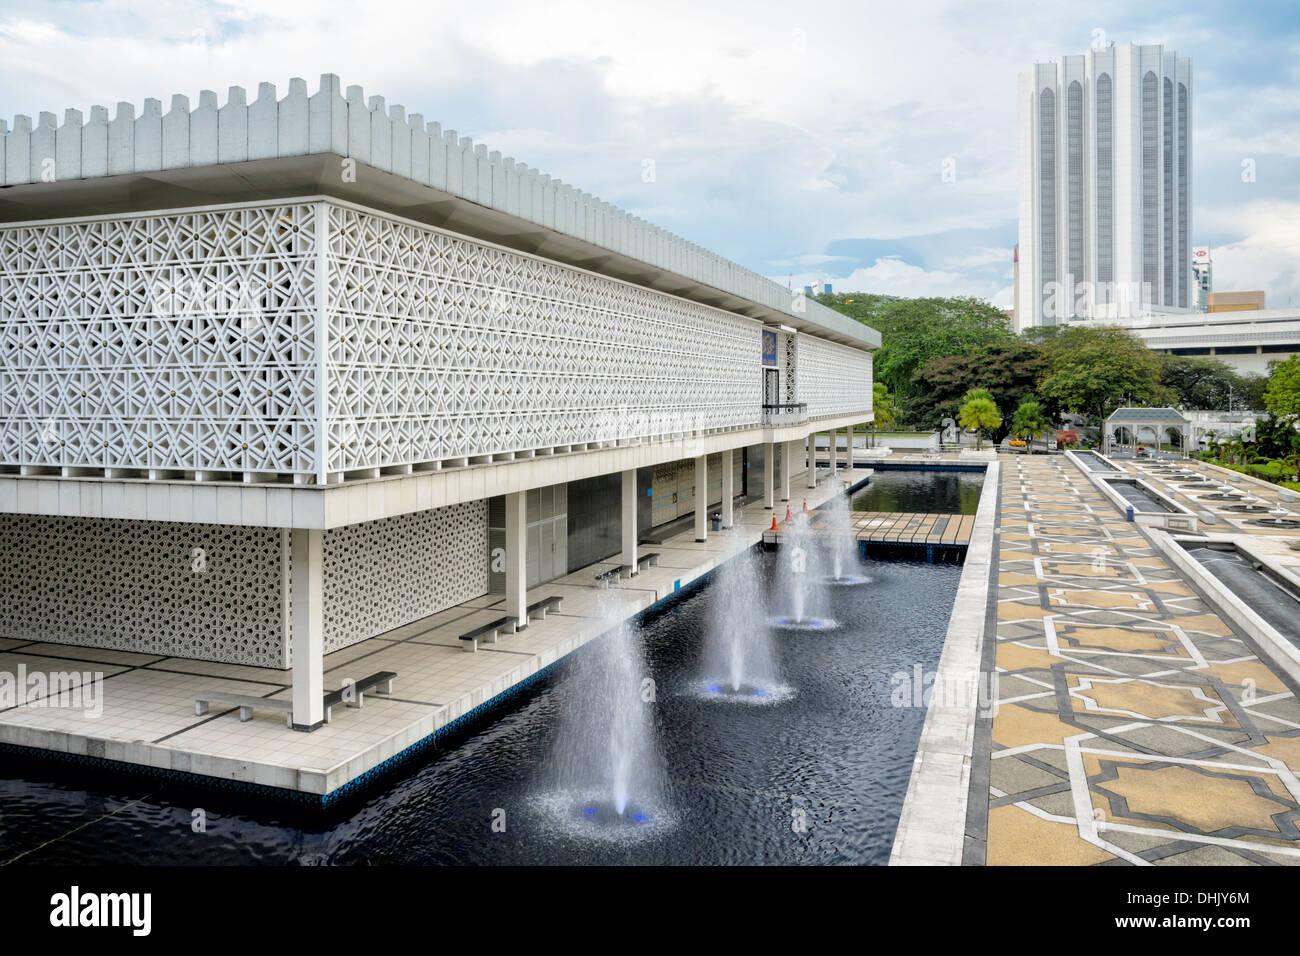 Modern religious architecture a contemporary mosque stock for Mosque exterior design